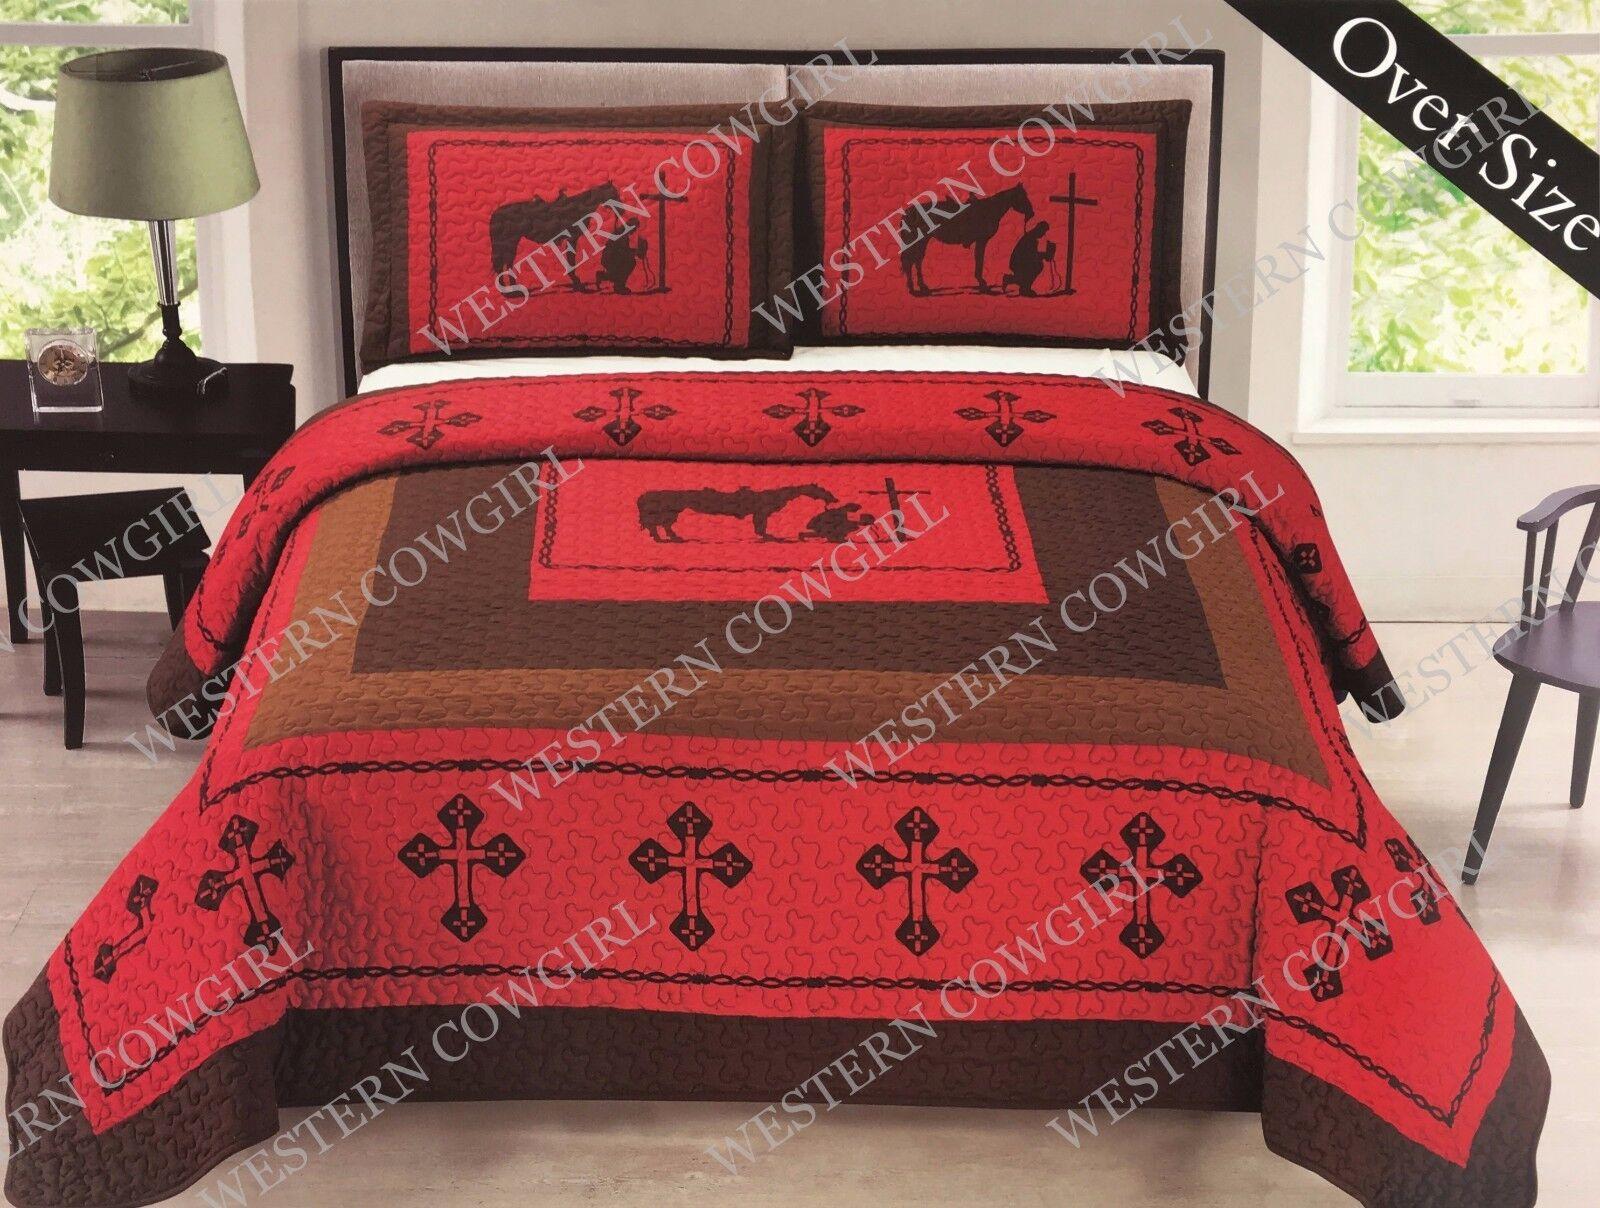 Texas Praying Cowboy Cross Western Quilt Bedspread